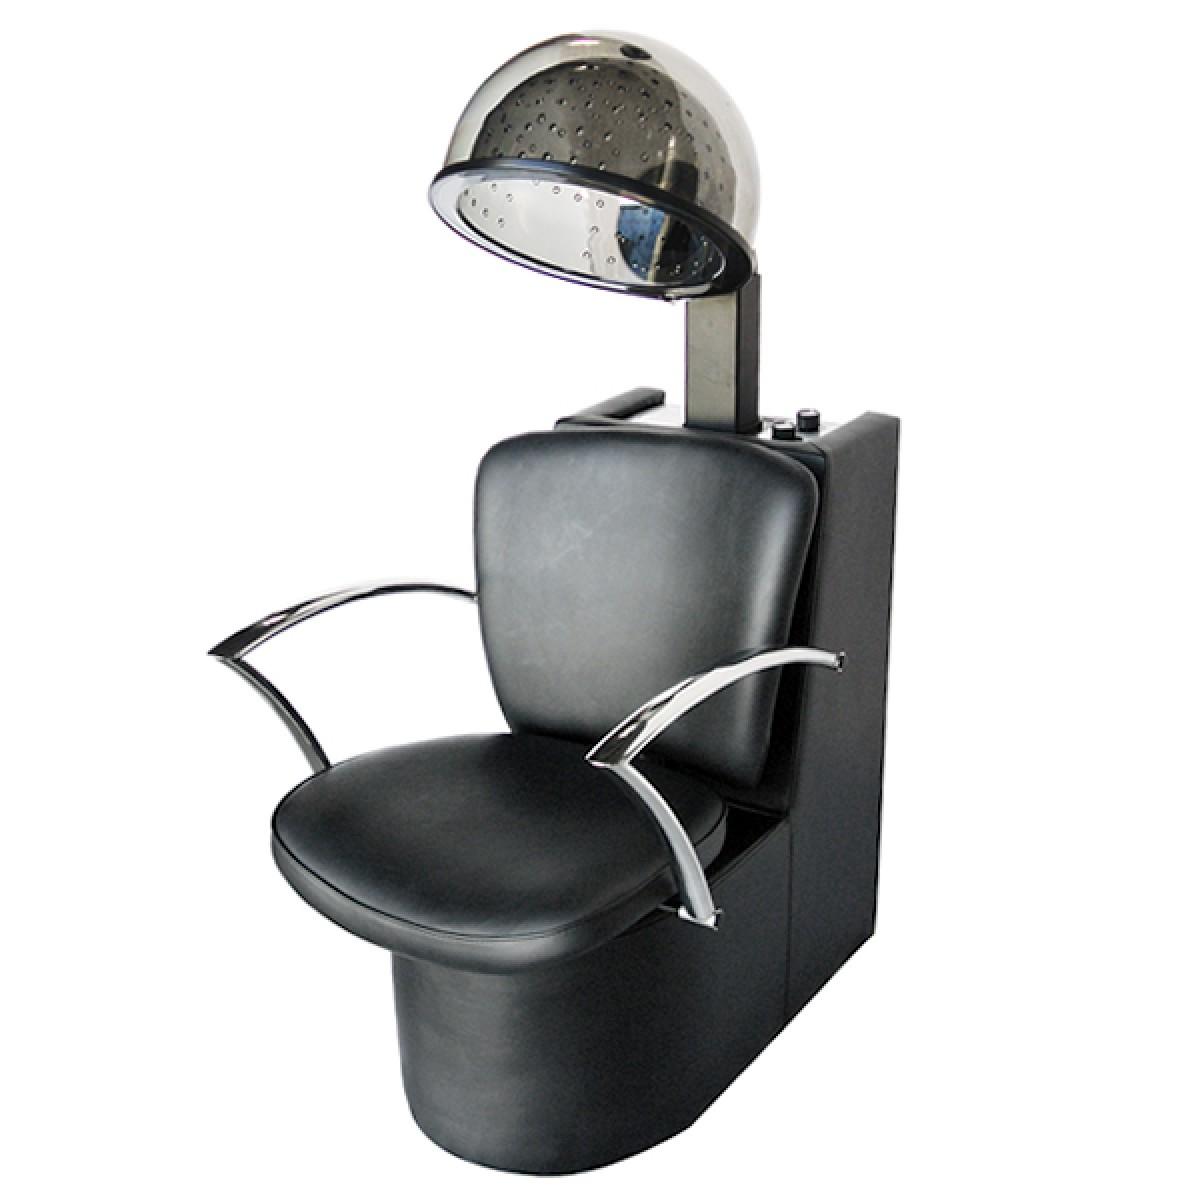 new york salon dryer chair. Black Bedroom Furniture Sets. Home Design Ideas